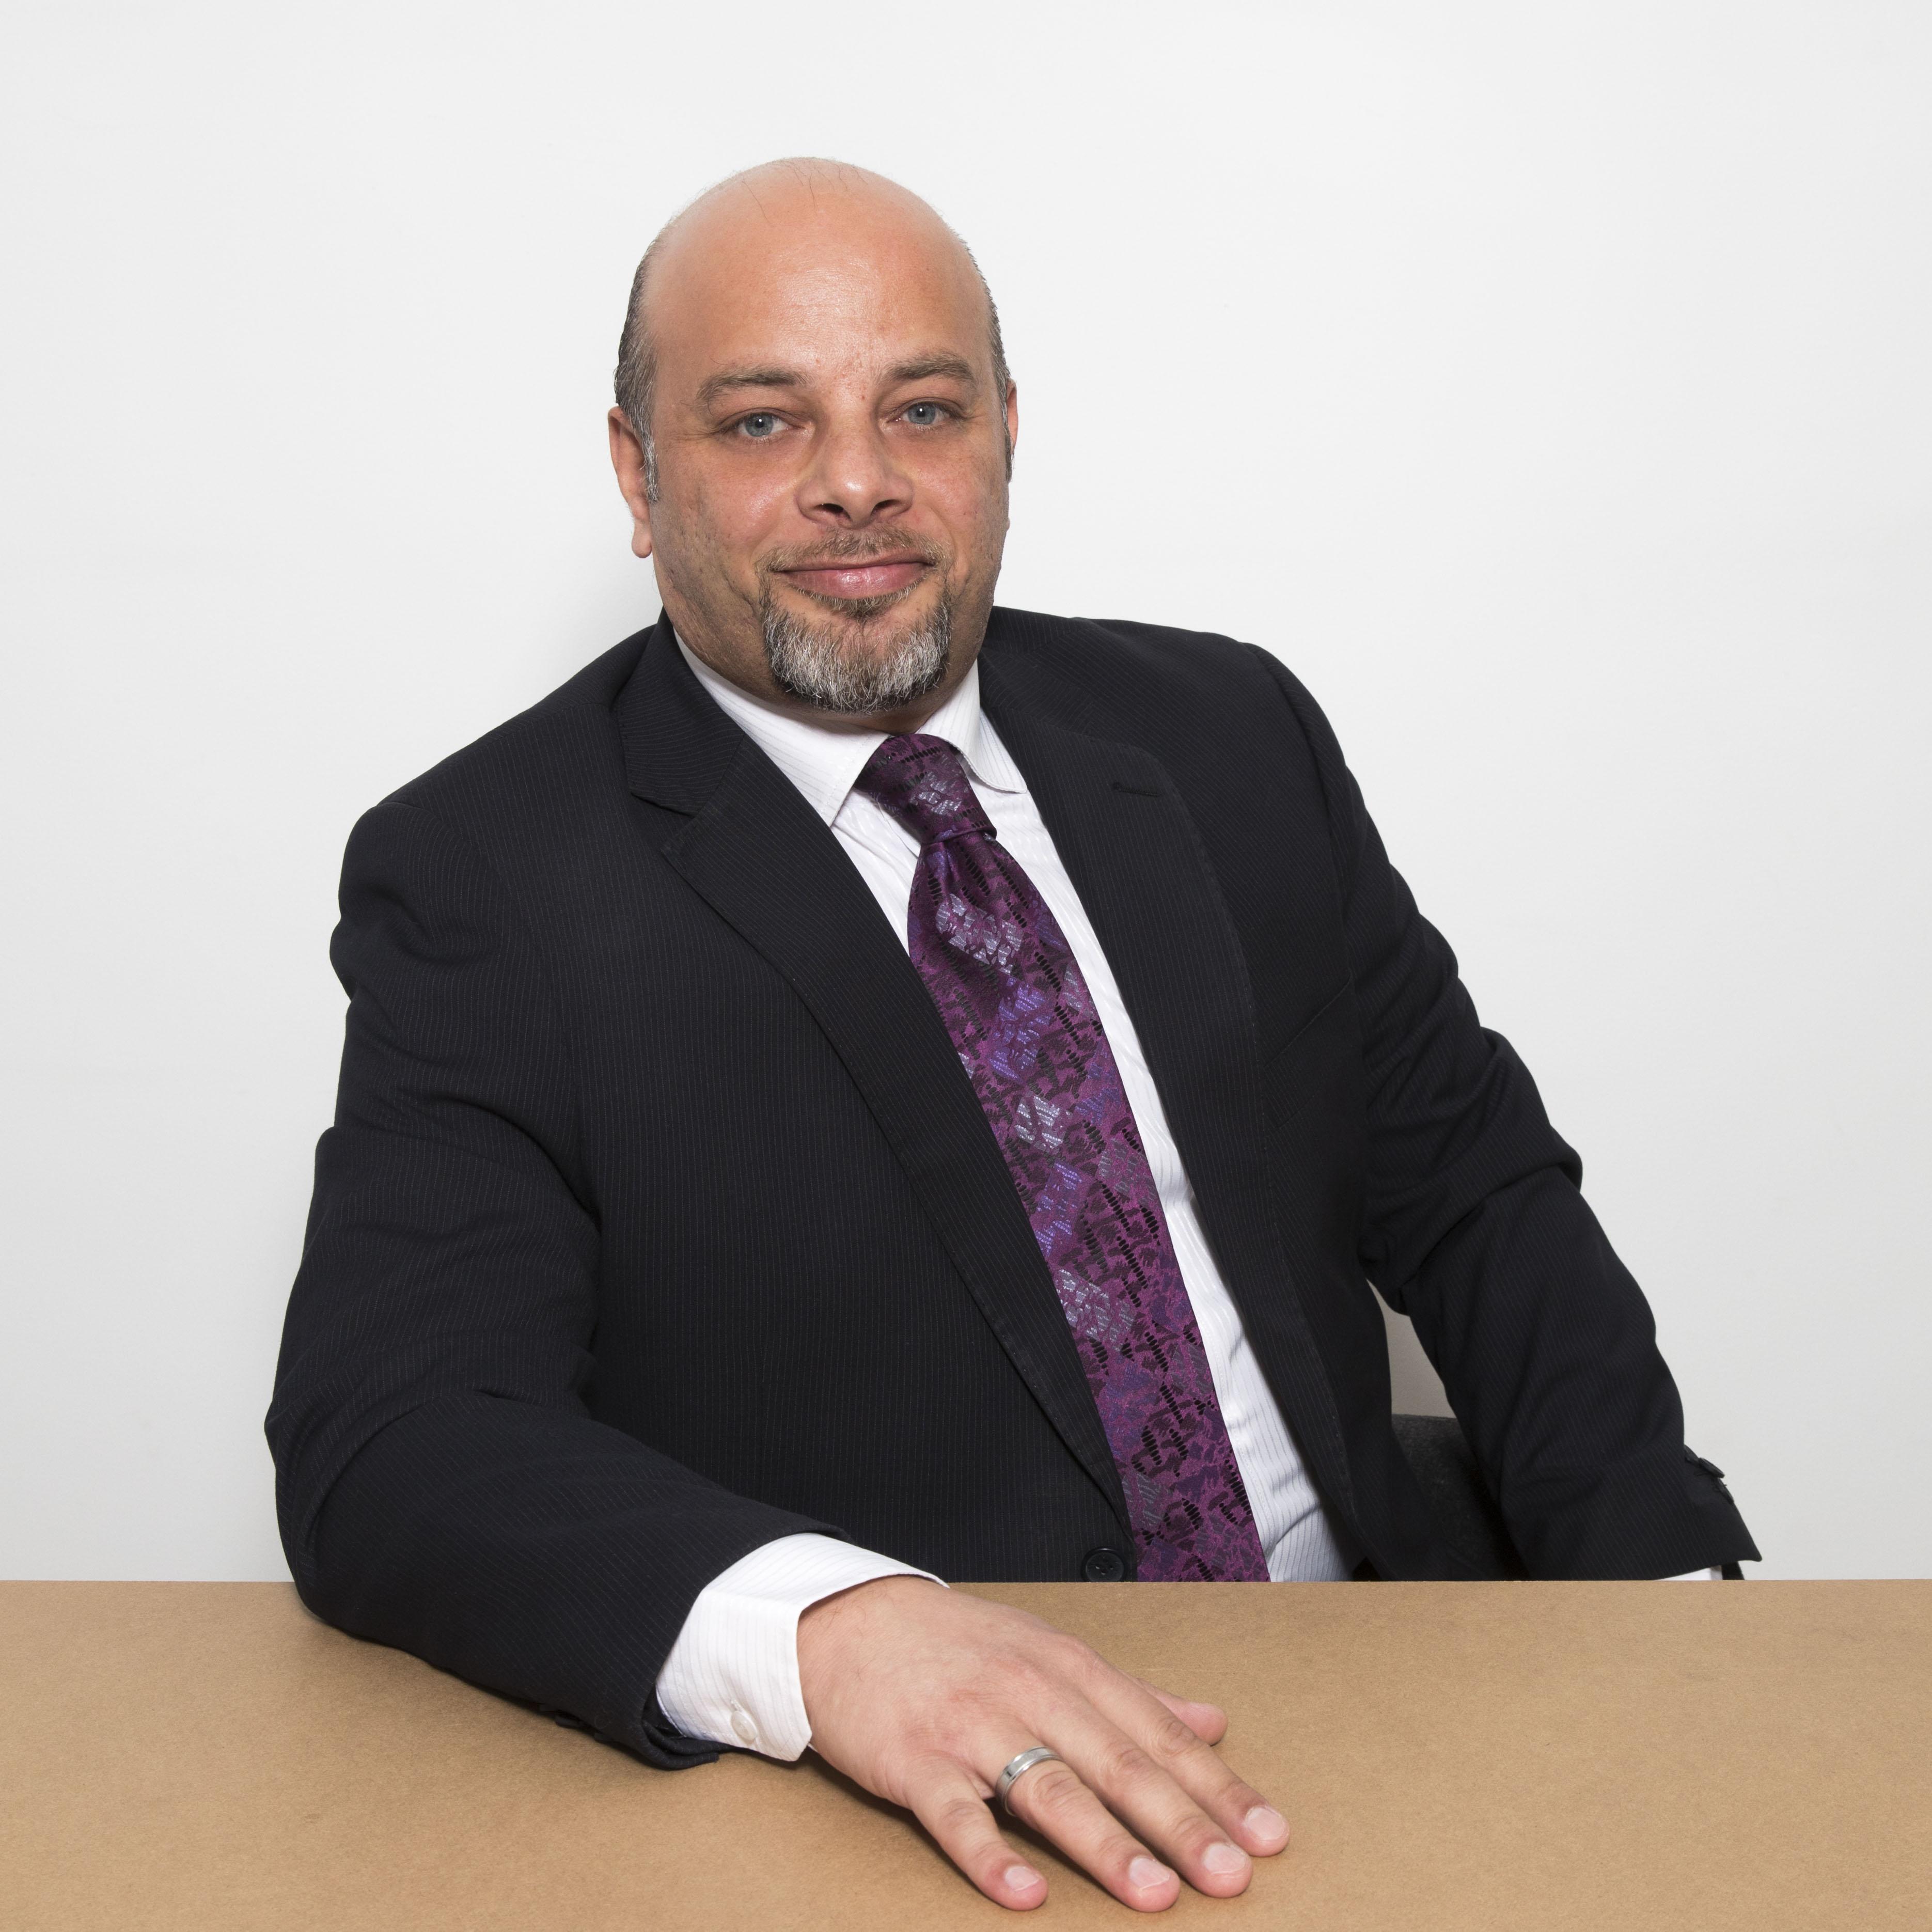 Ayham Tesbahji